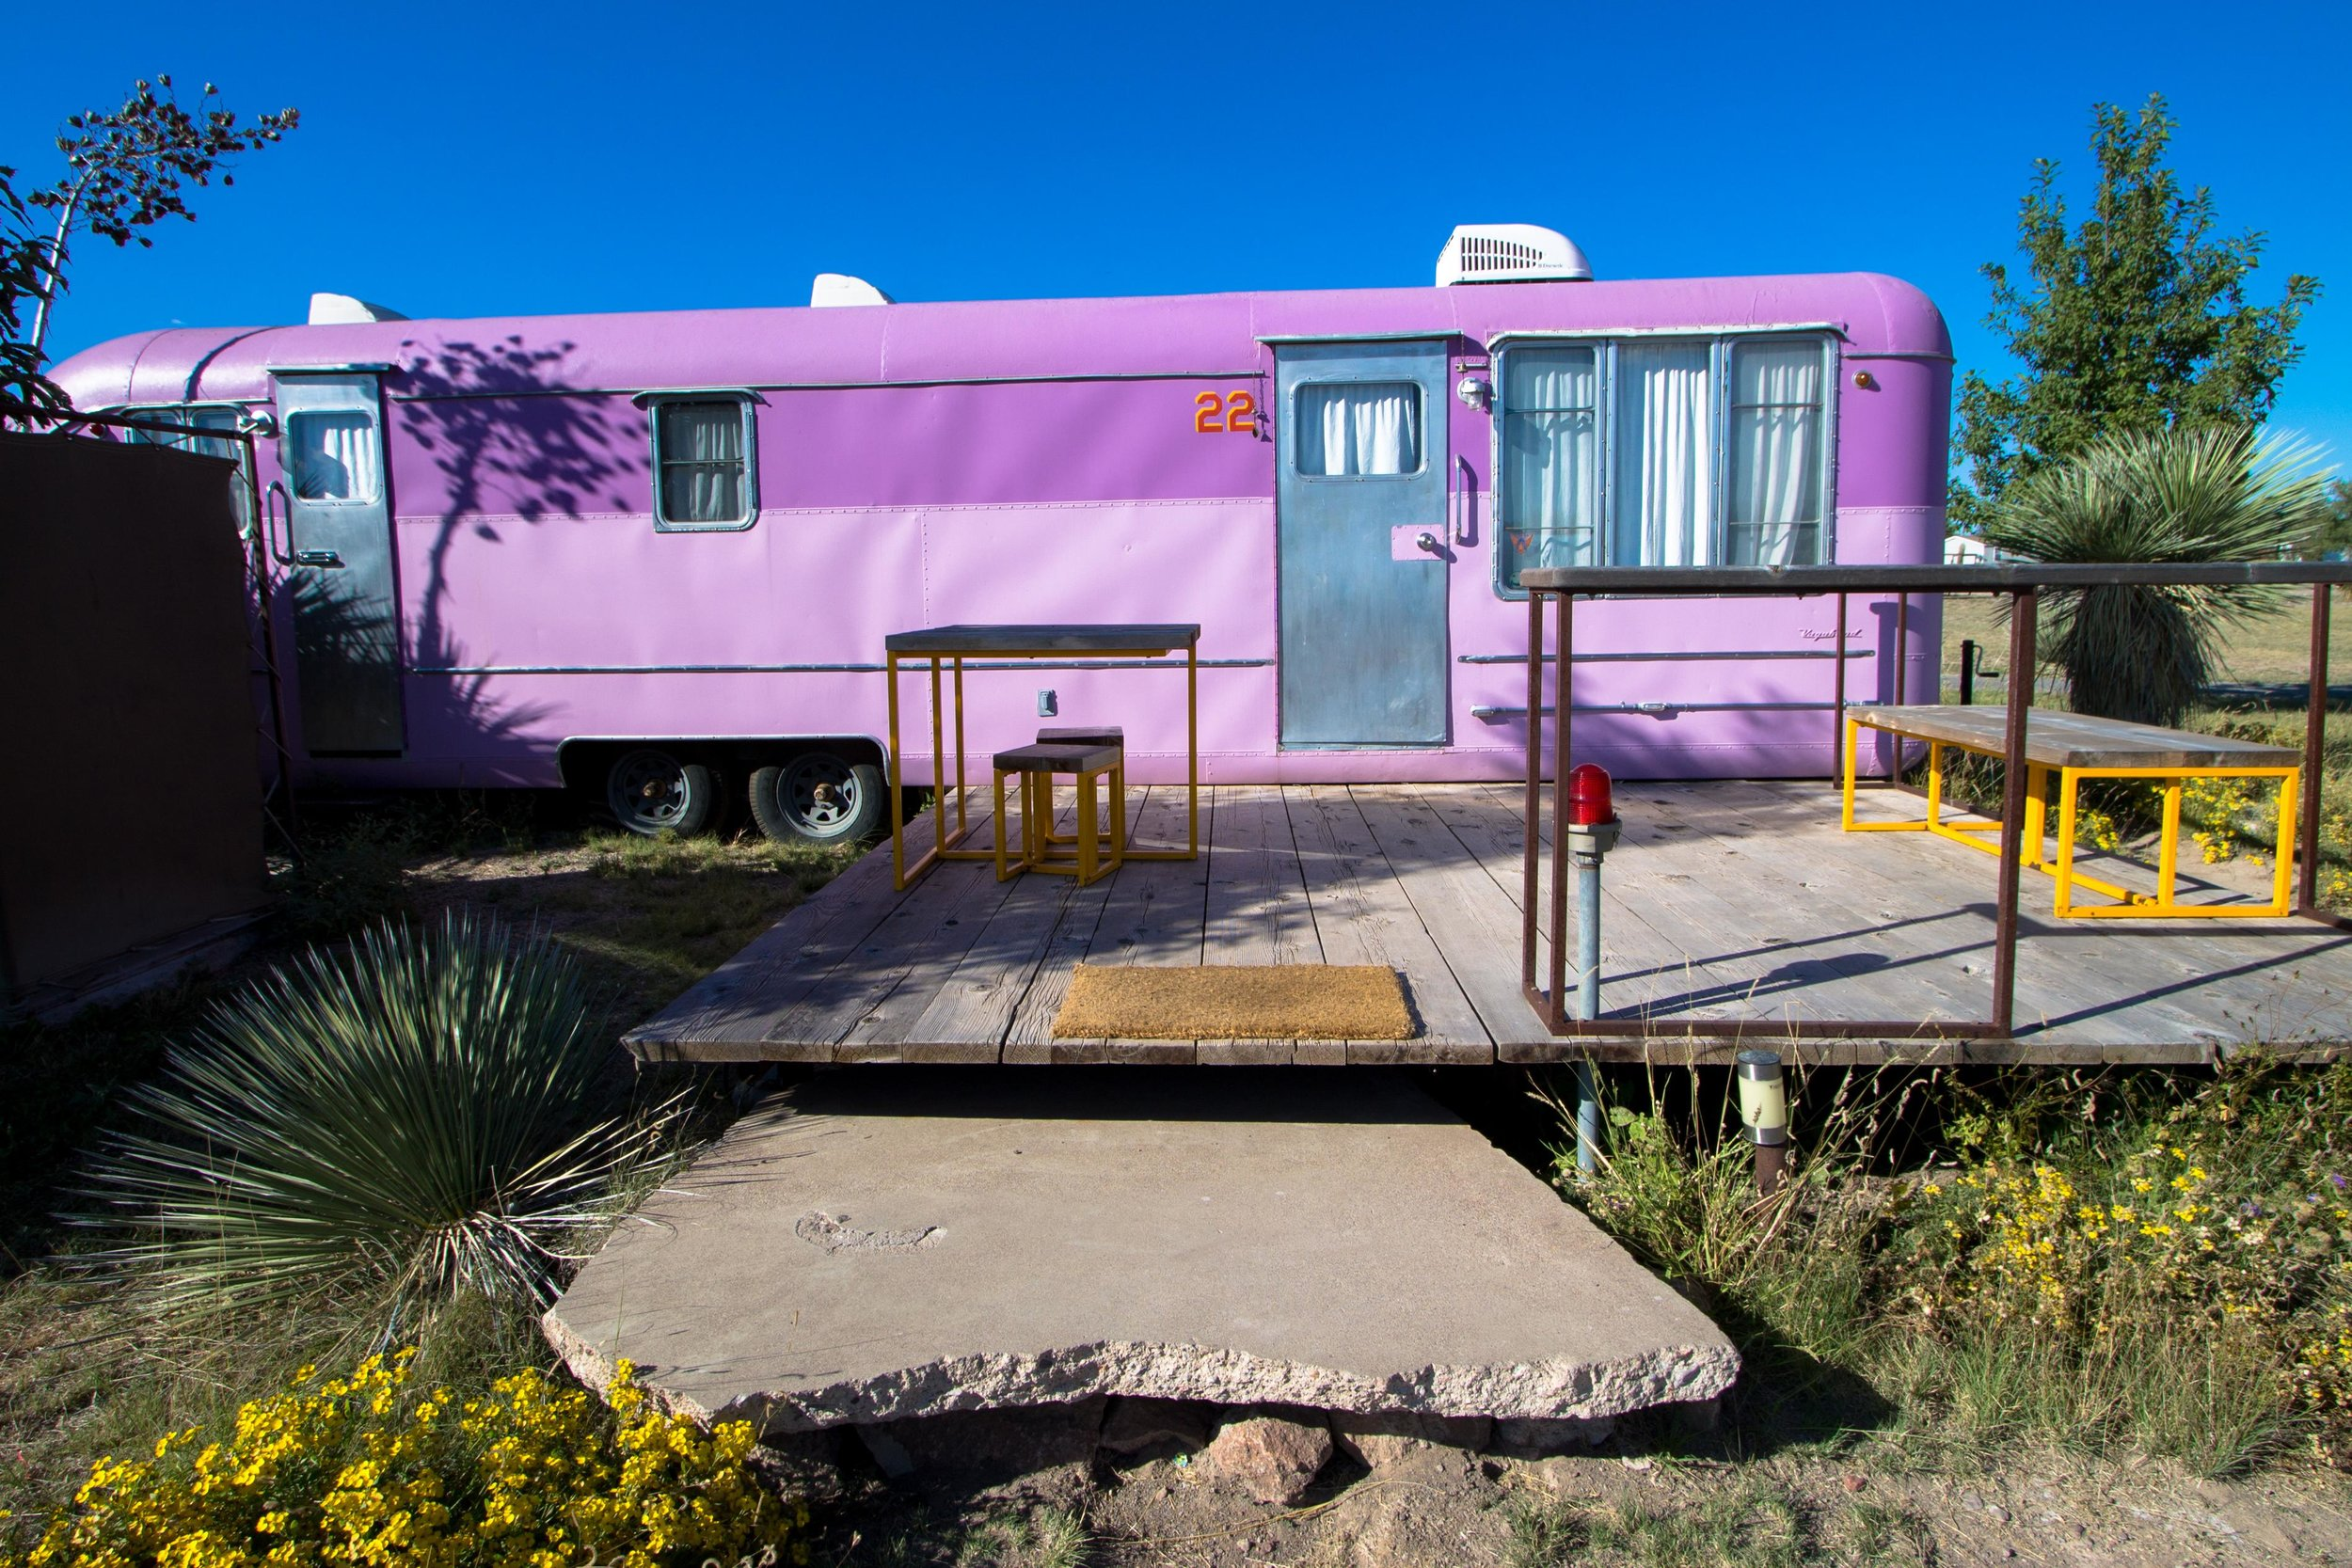 One of many vintage trailers at El Cosmico.